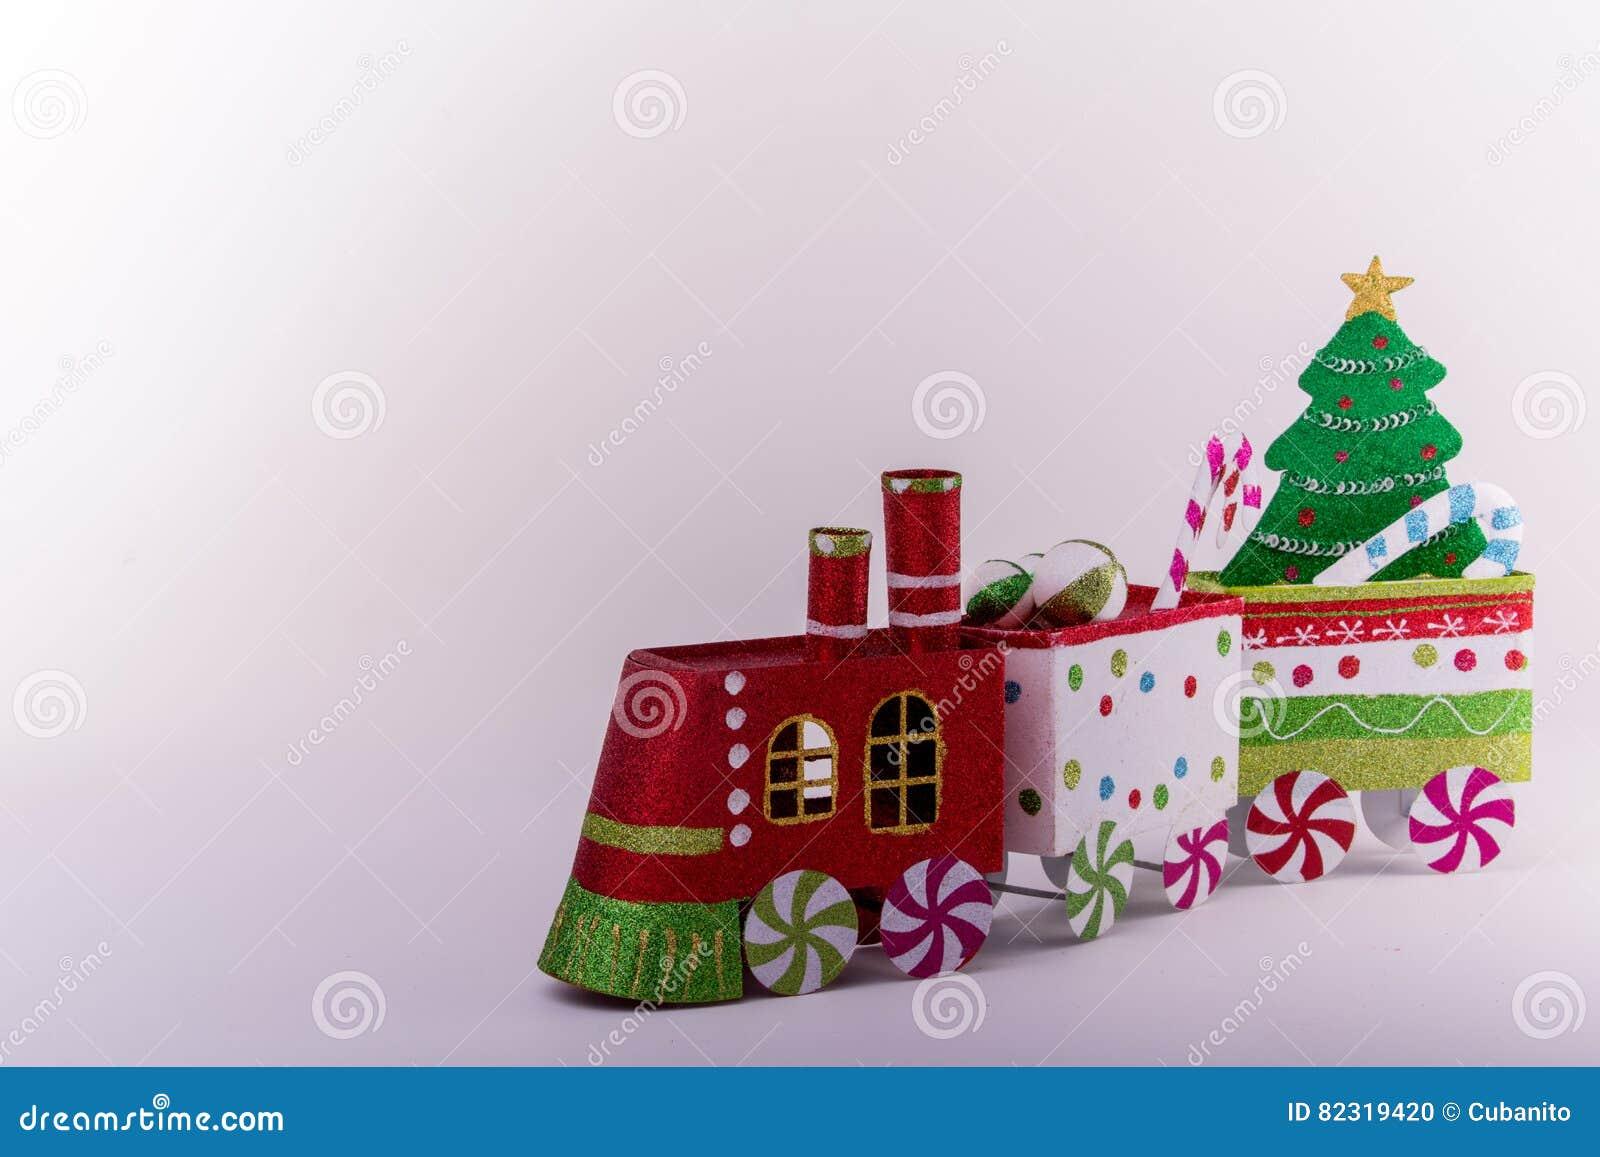 Christmas train ornaments stock photo. Image of celebration - 82319420